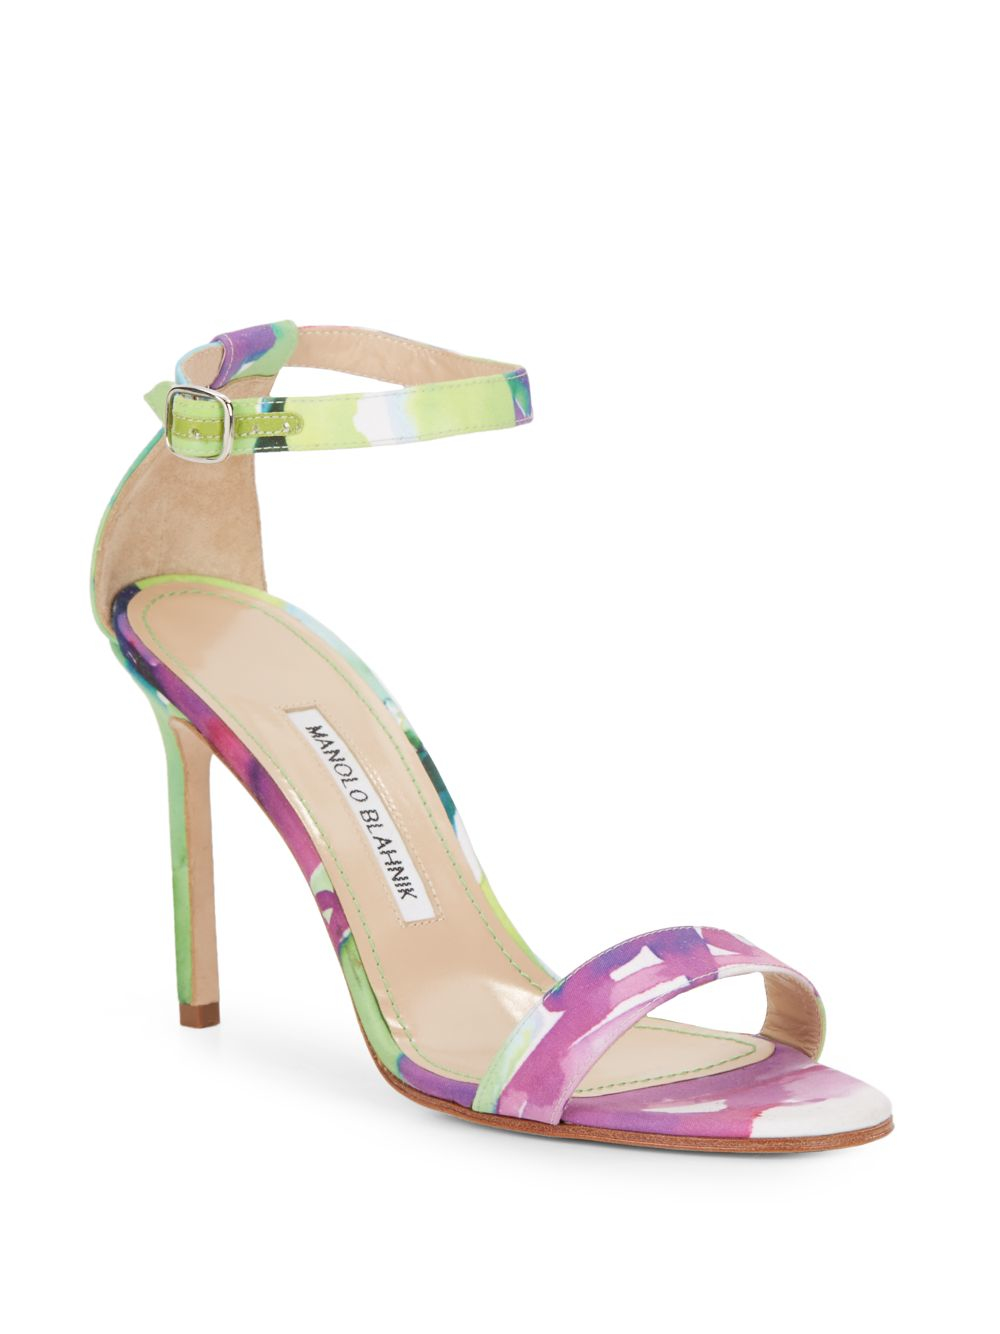 9501070cca6a manolo blahnik green sandals